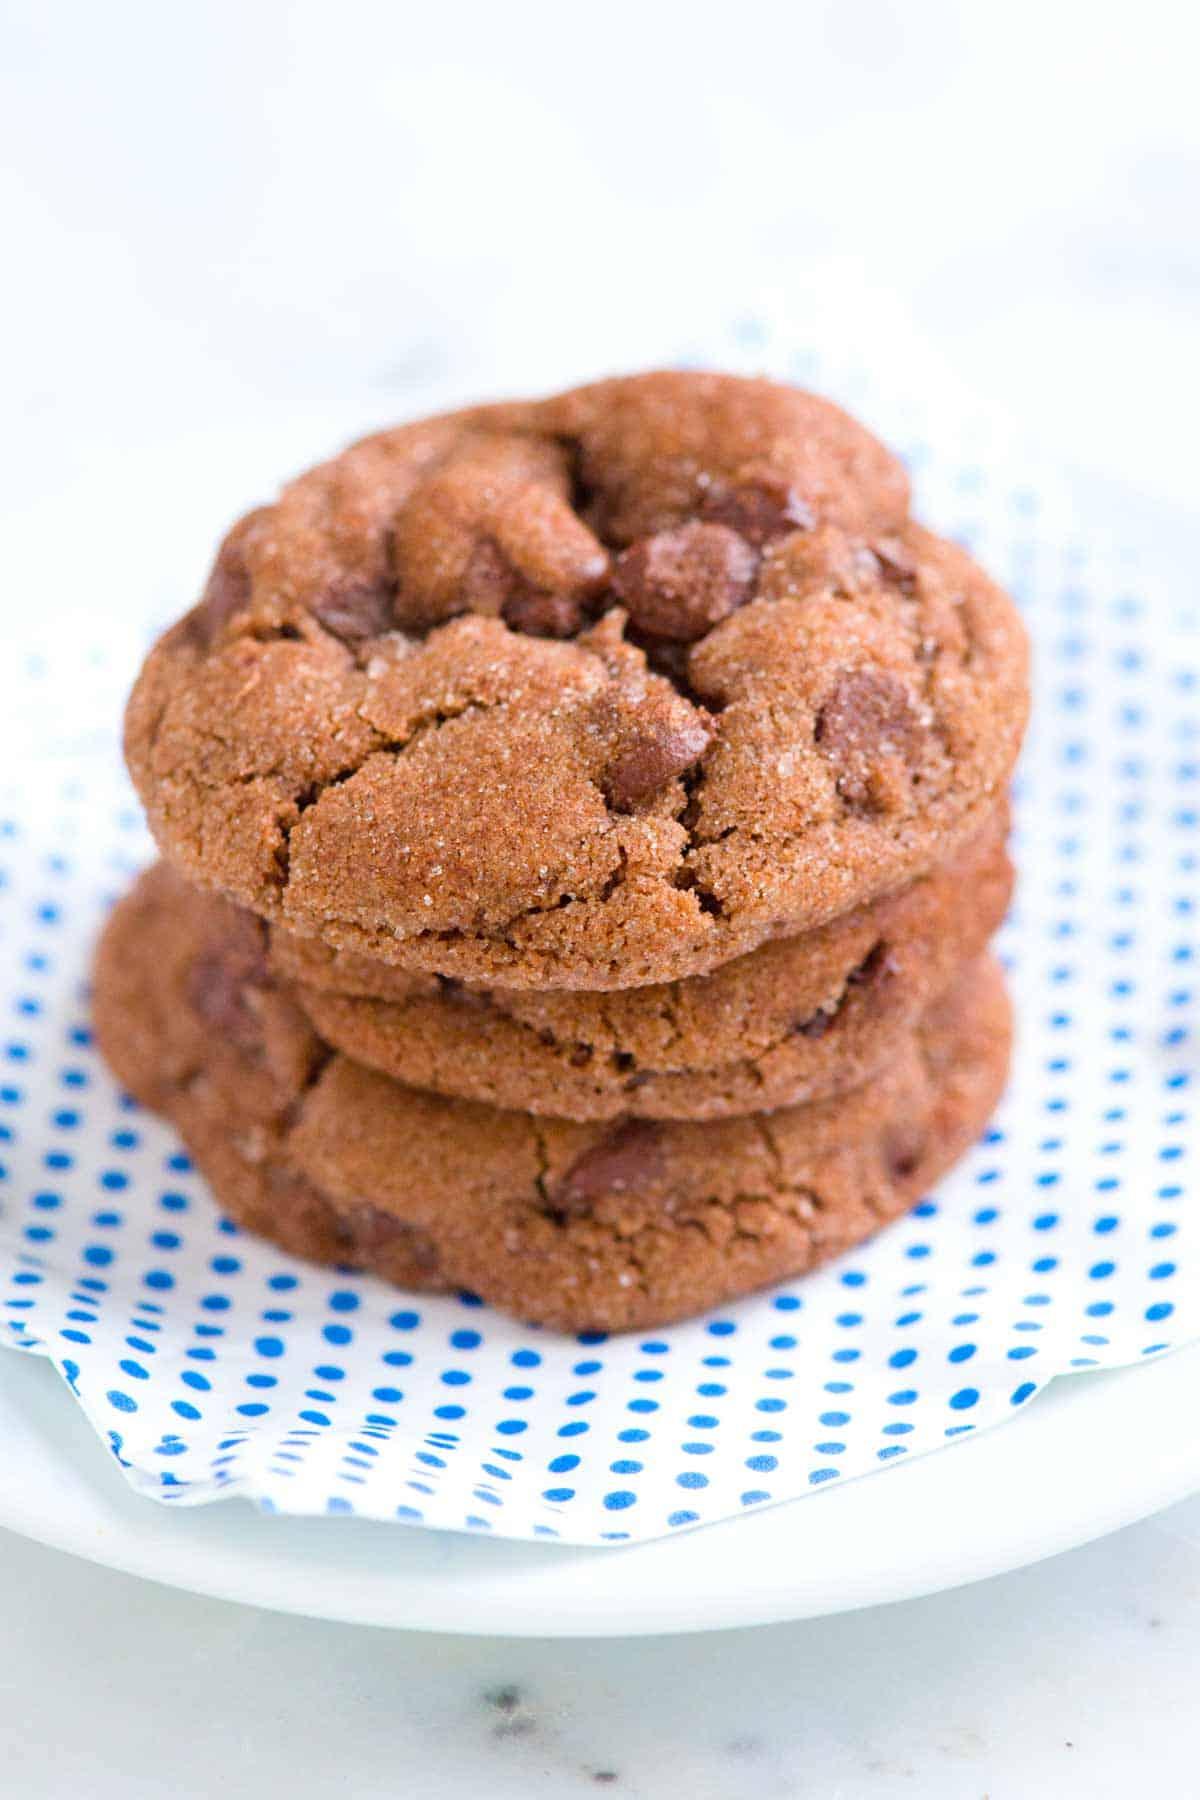 How to Make Cinnamon Chocolate Cookies